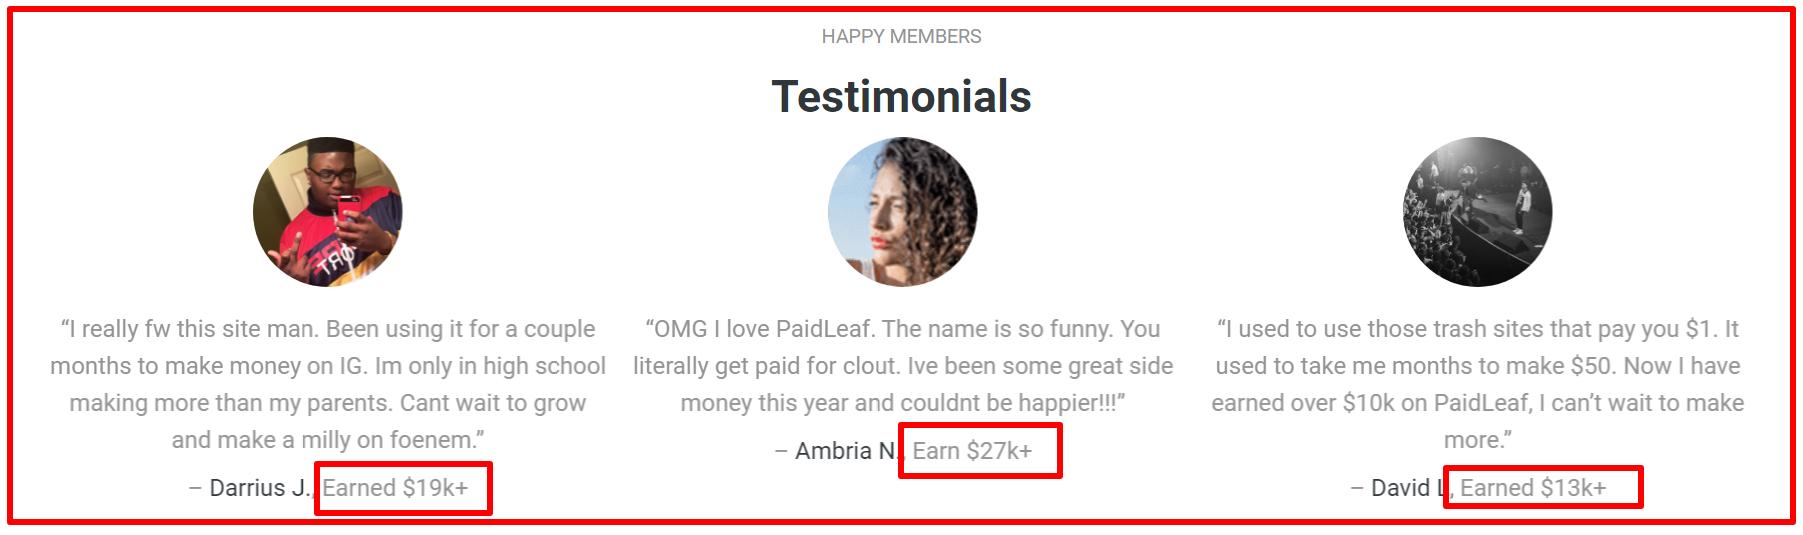 paid leaf testimonials